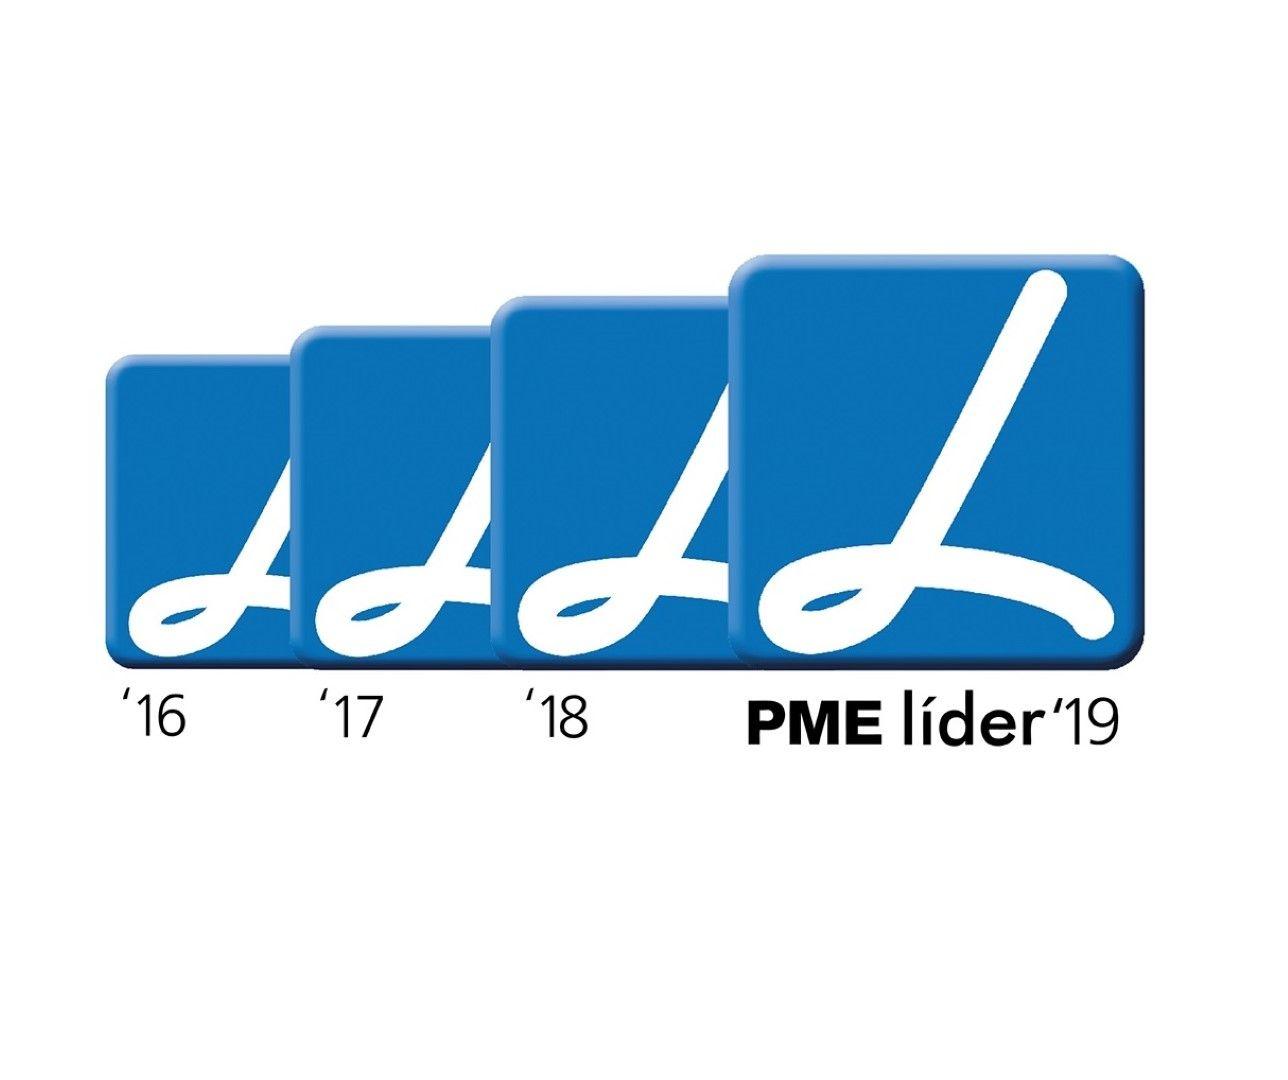 Salsamotor é PME Líder 2019